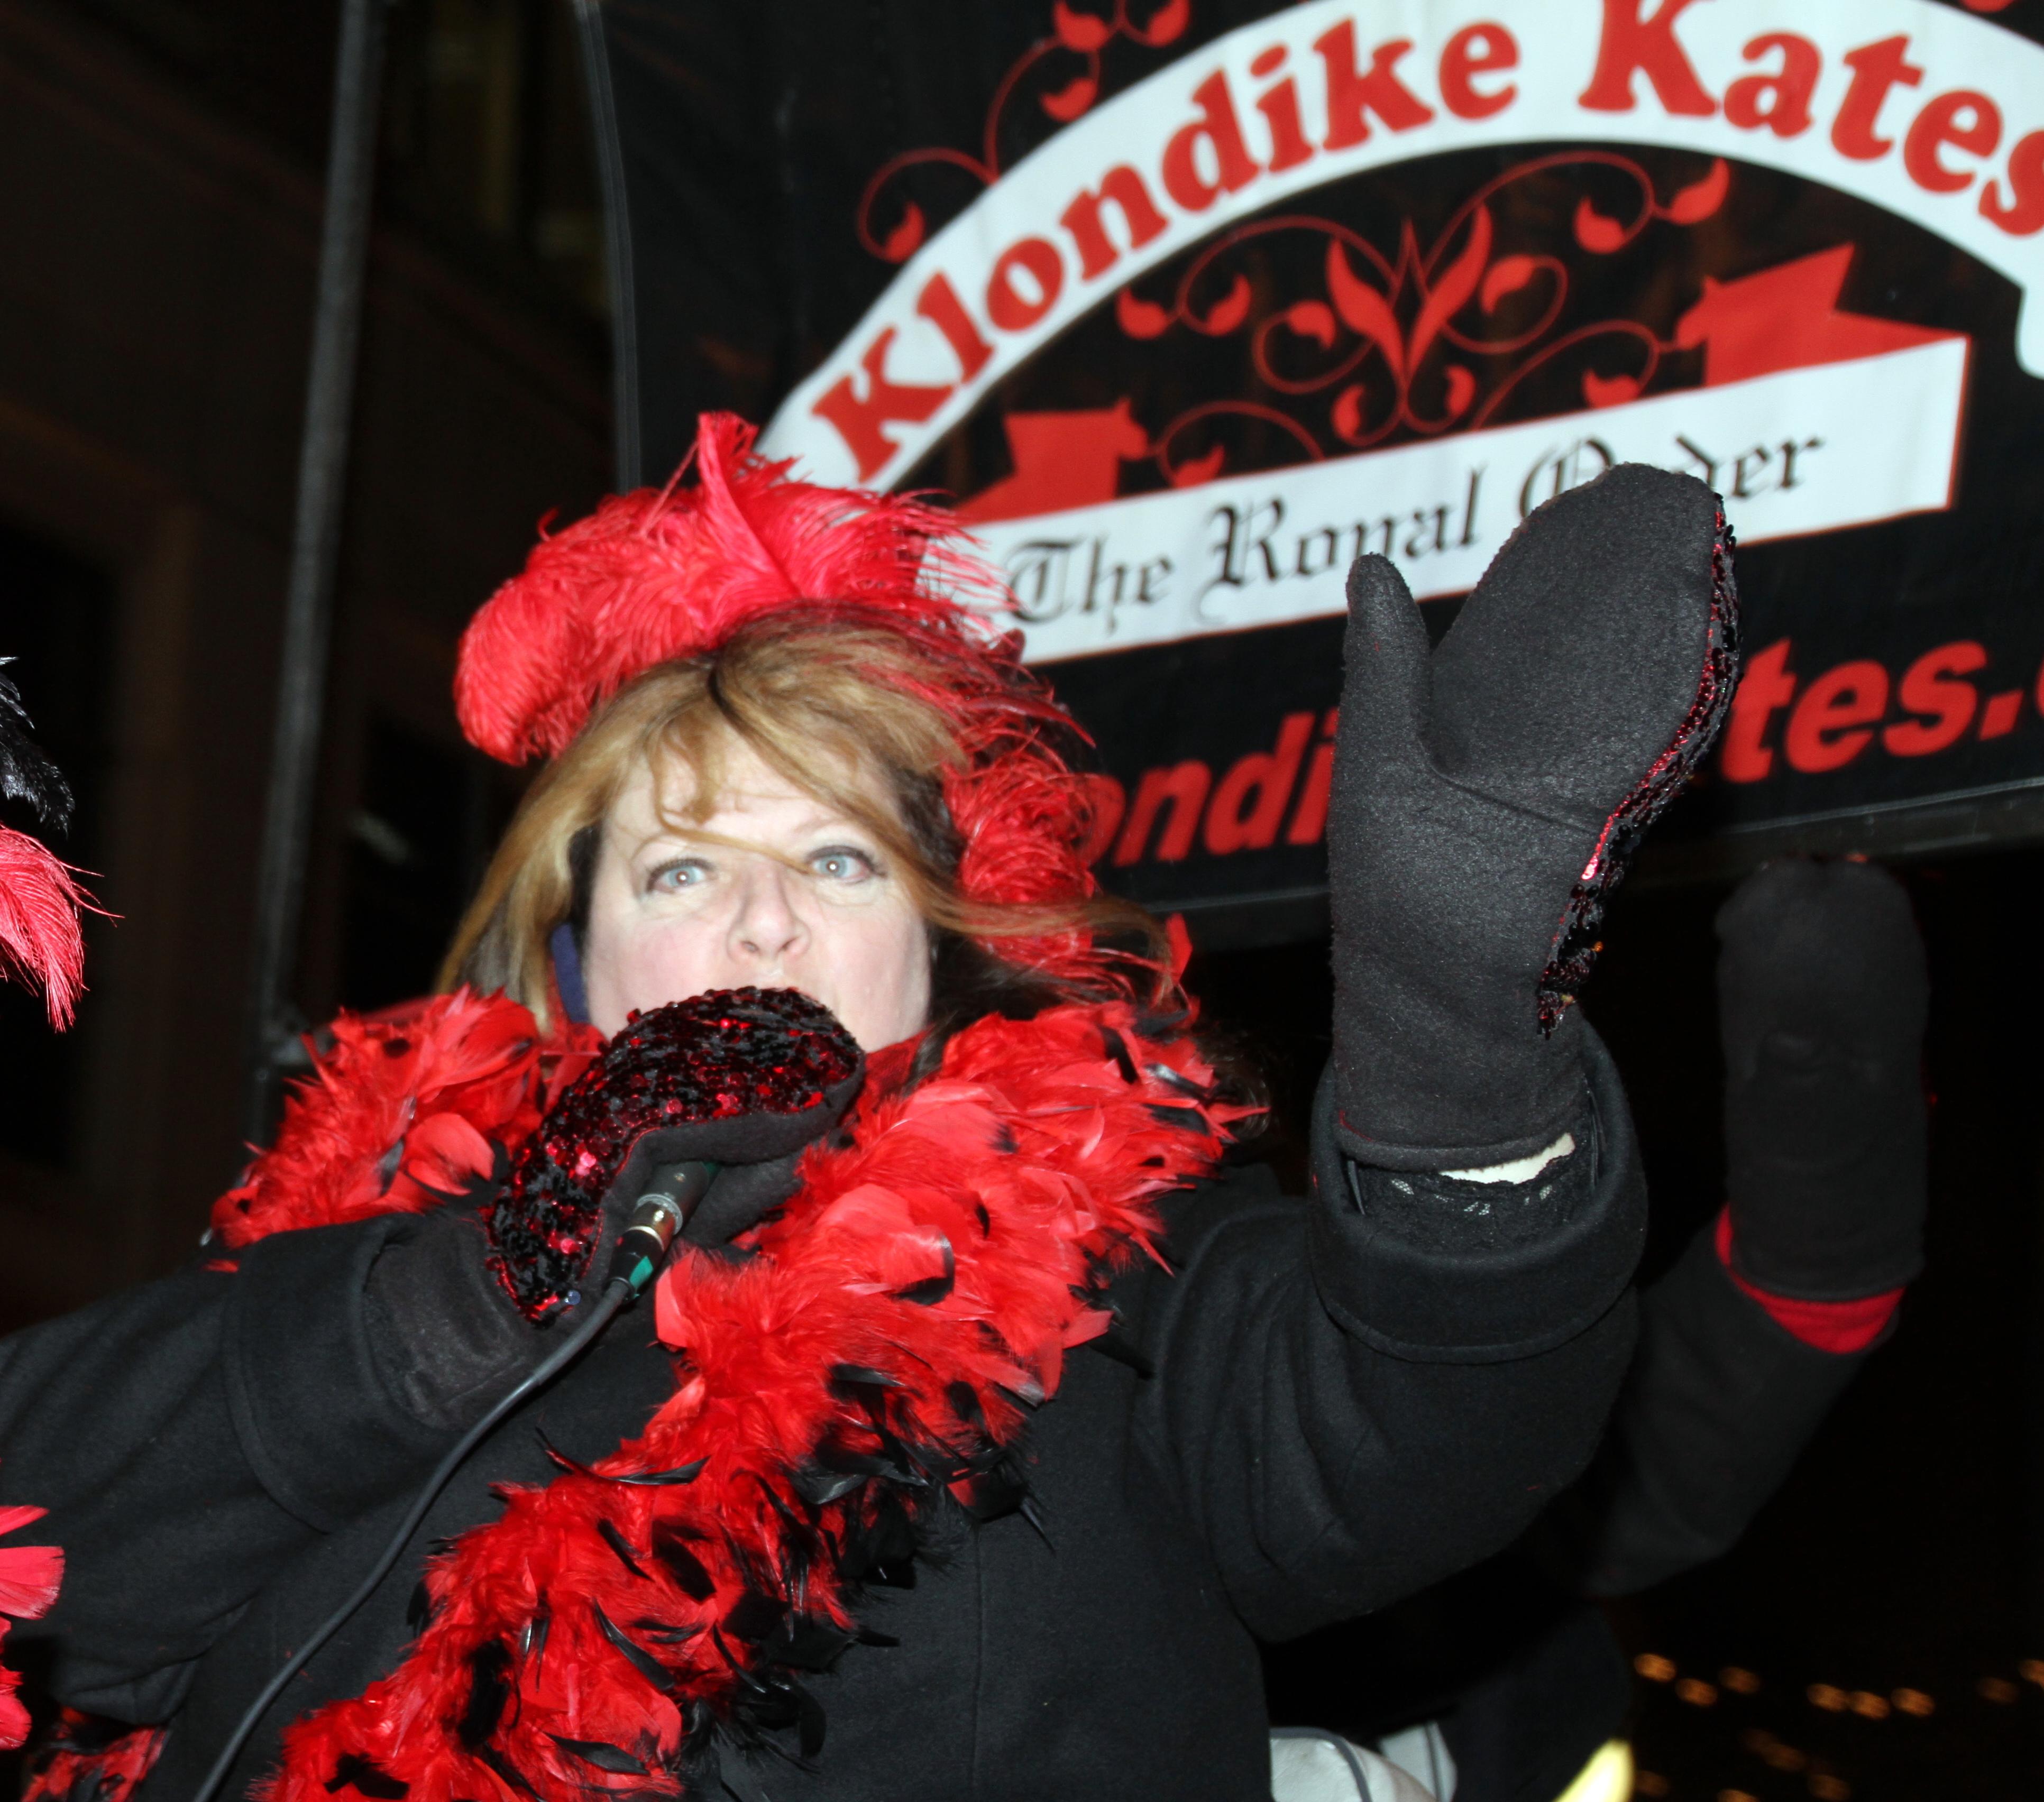 Klondike Kate 2014